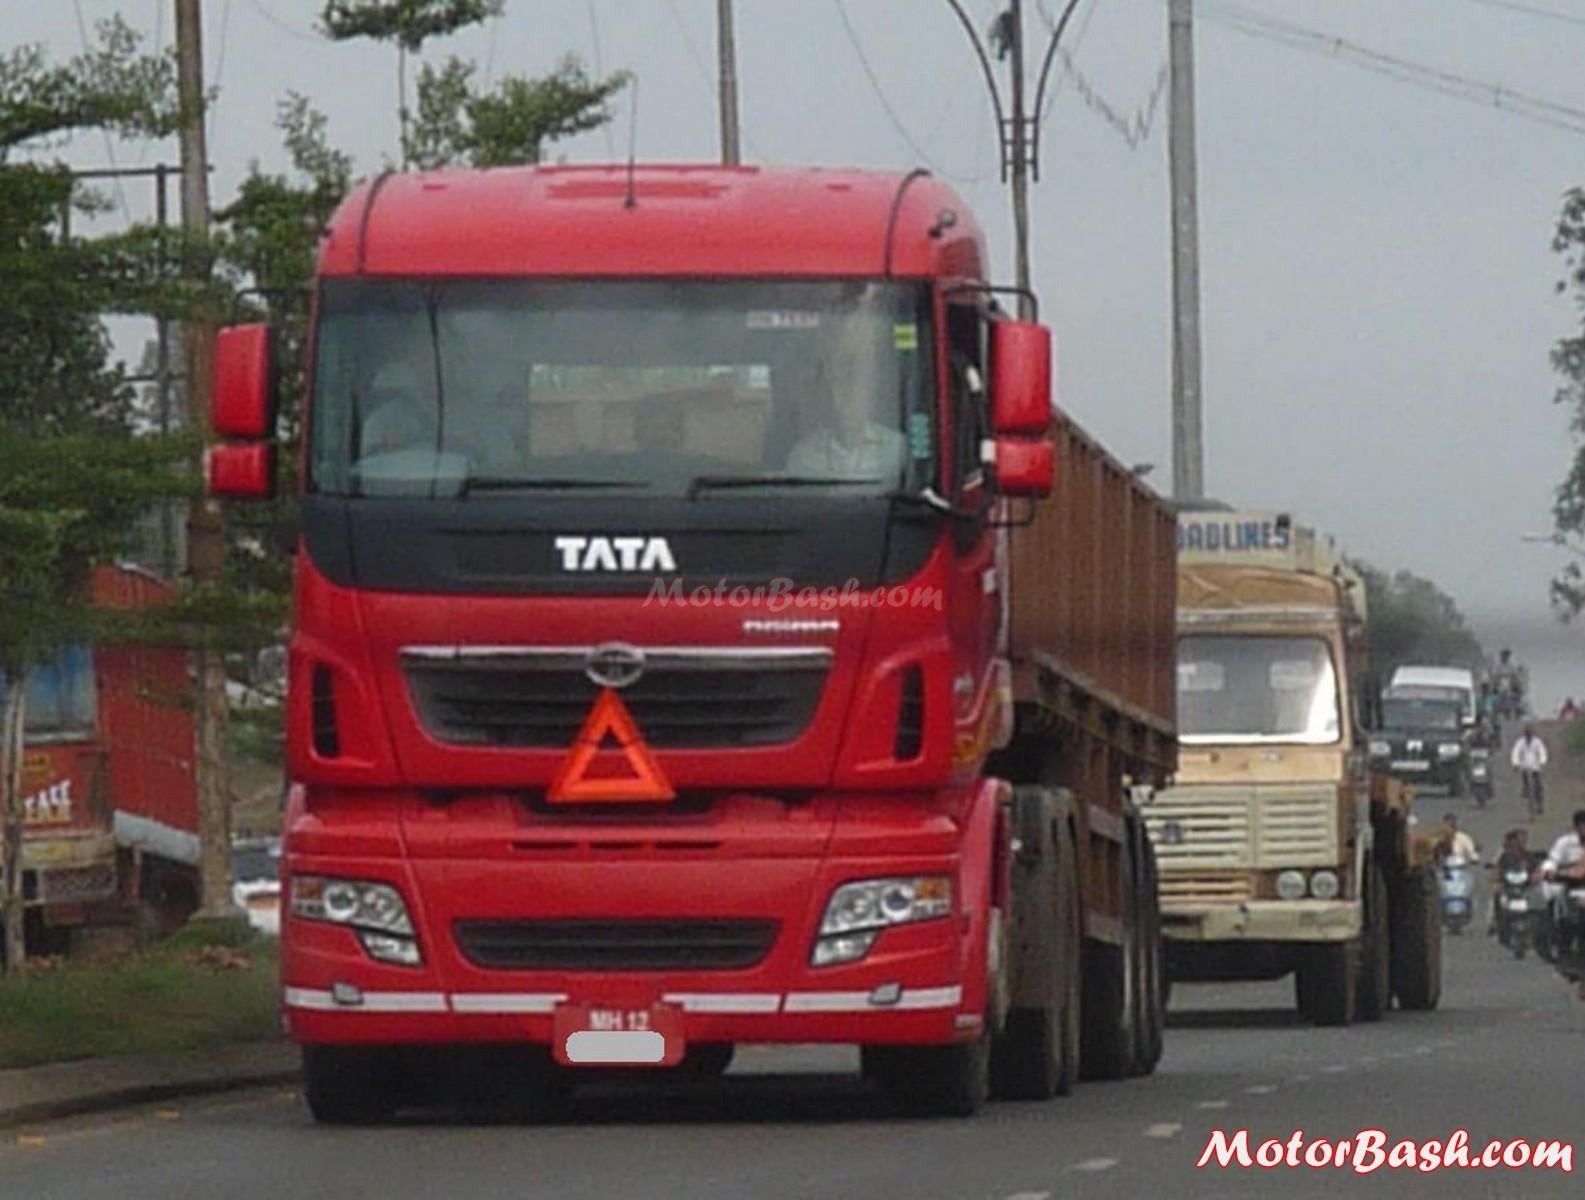 Tata-Prima-Truck-by-MotorBash